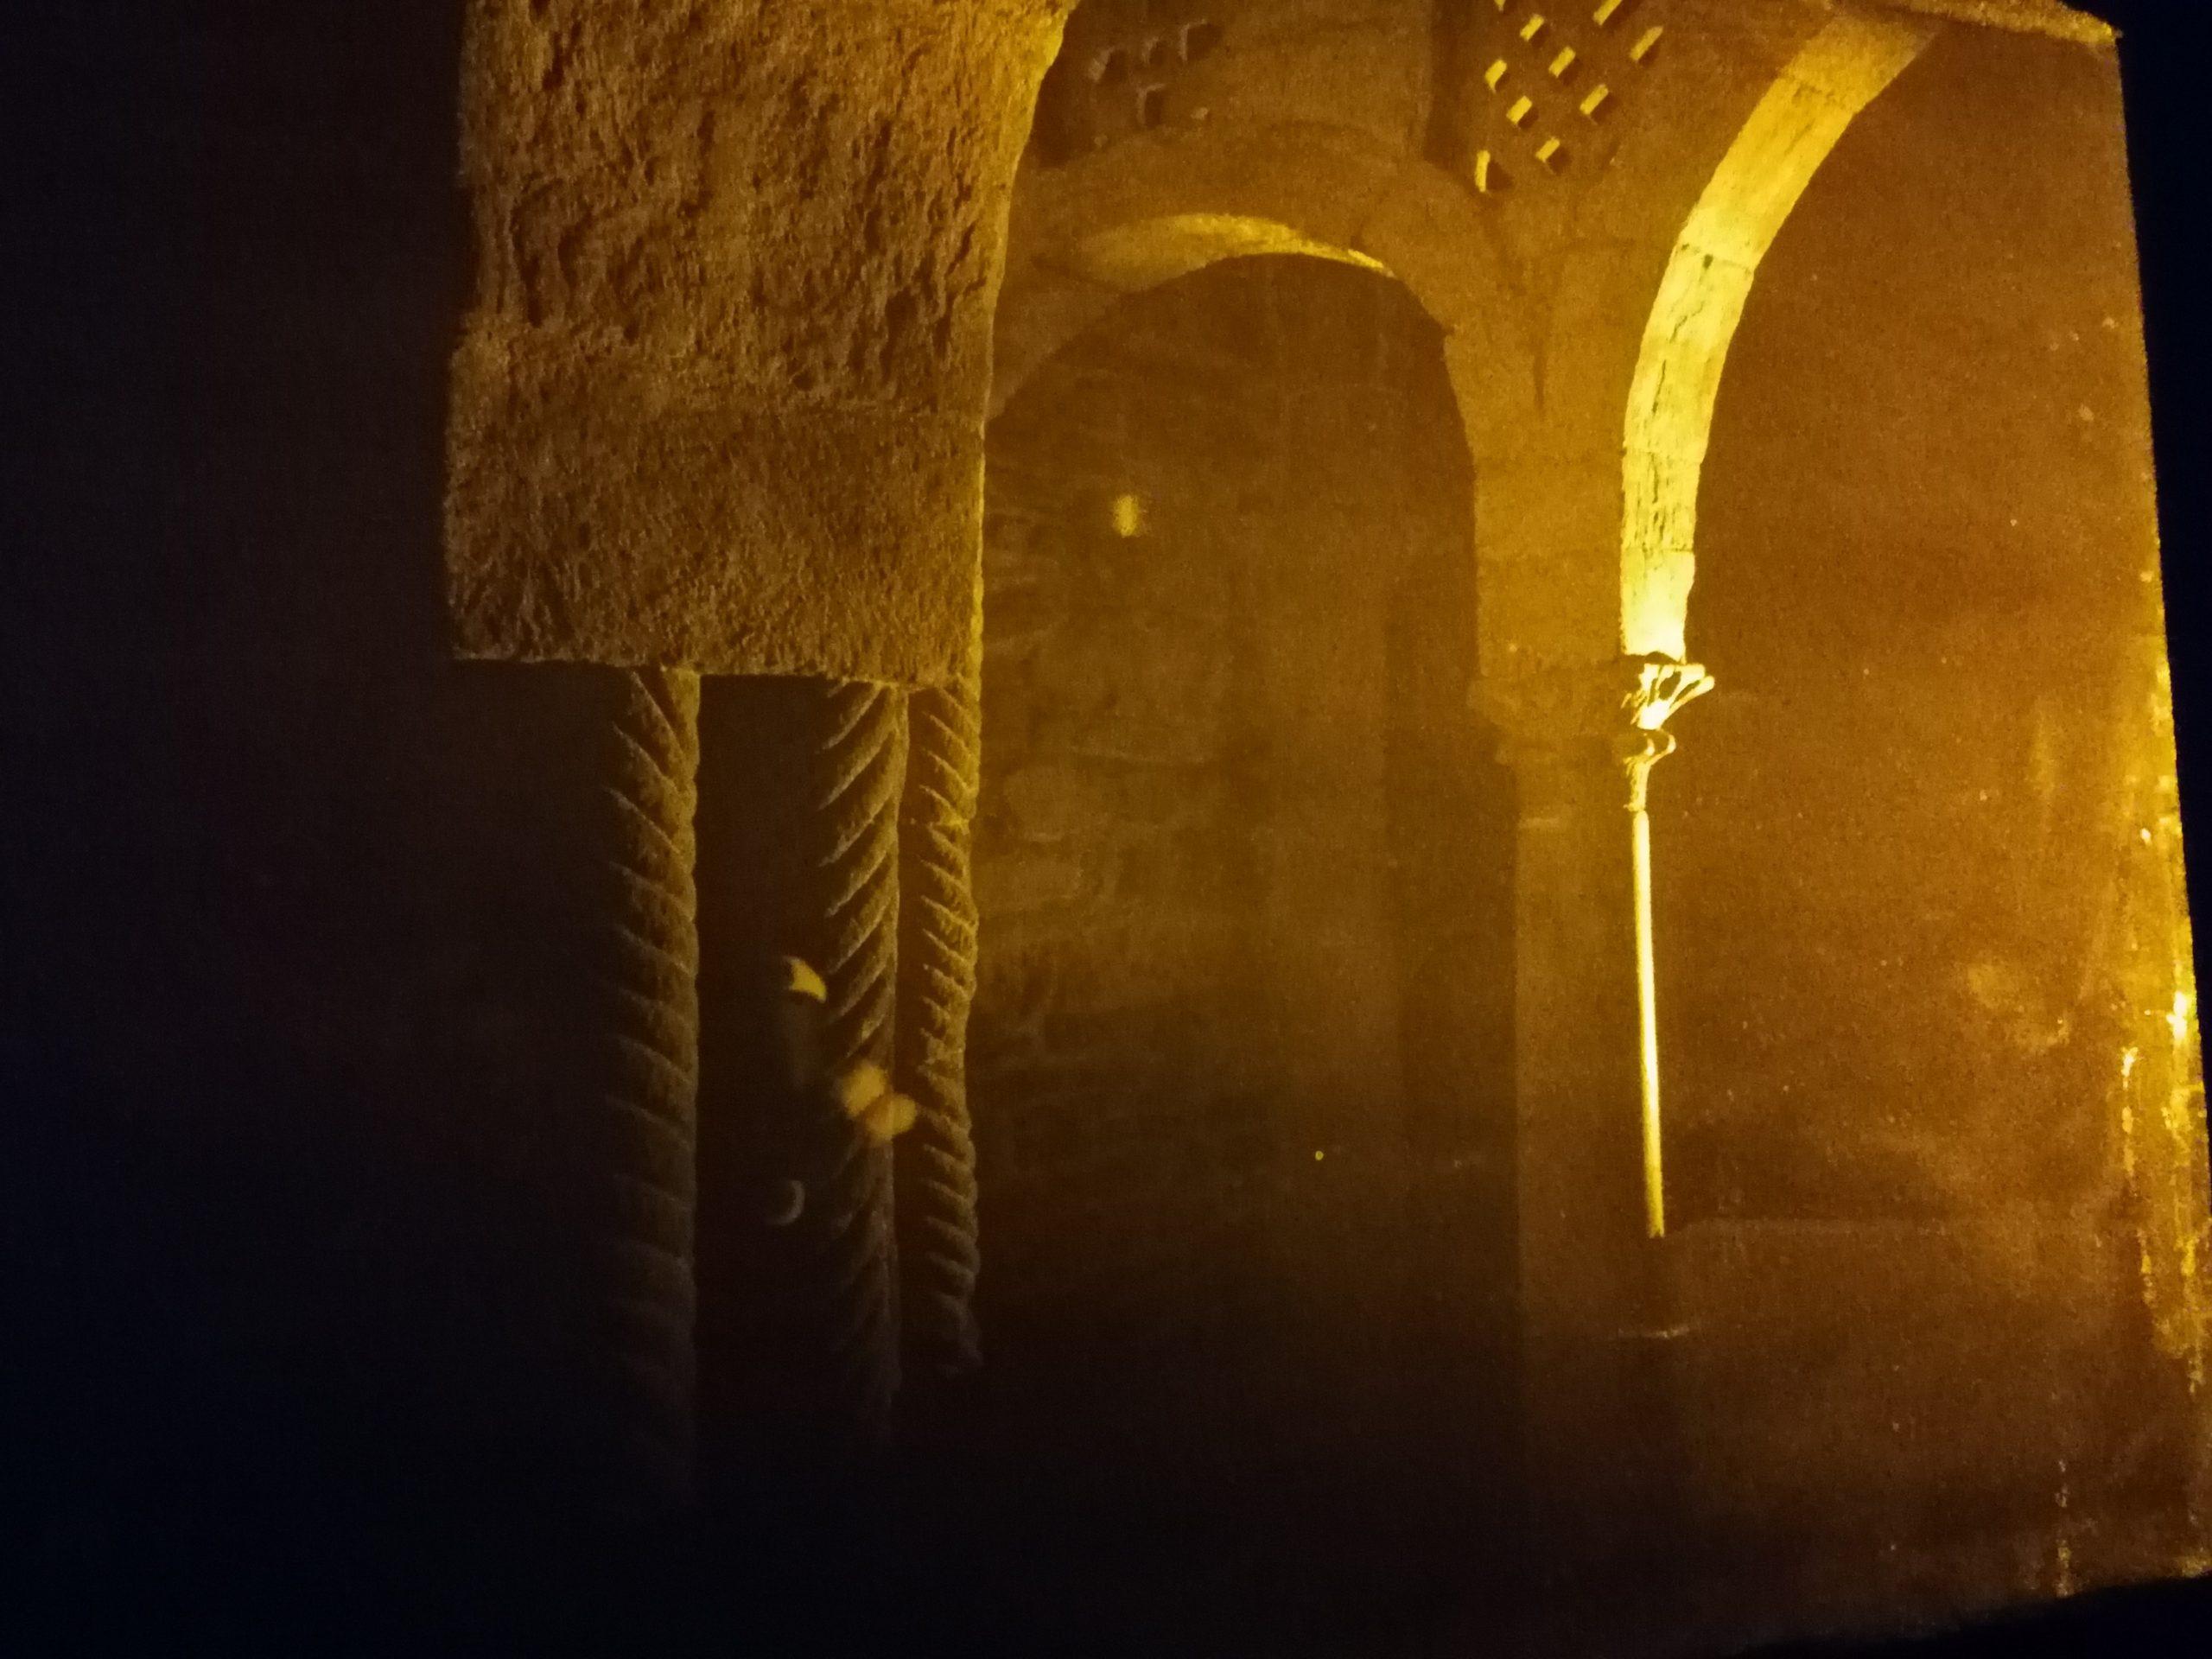 Holograma de campo profundo de la Iglesia de Santa Cristina de Lena